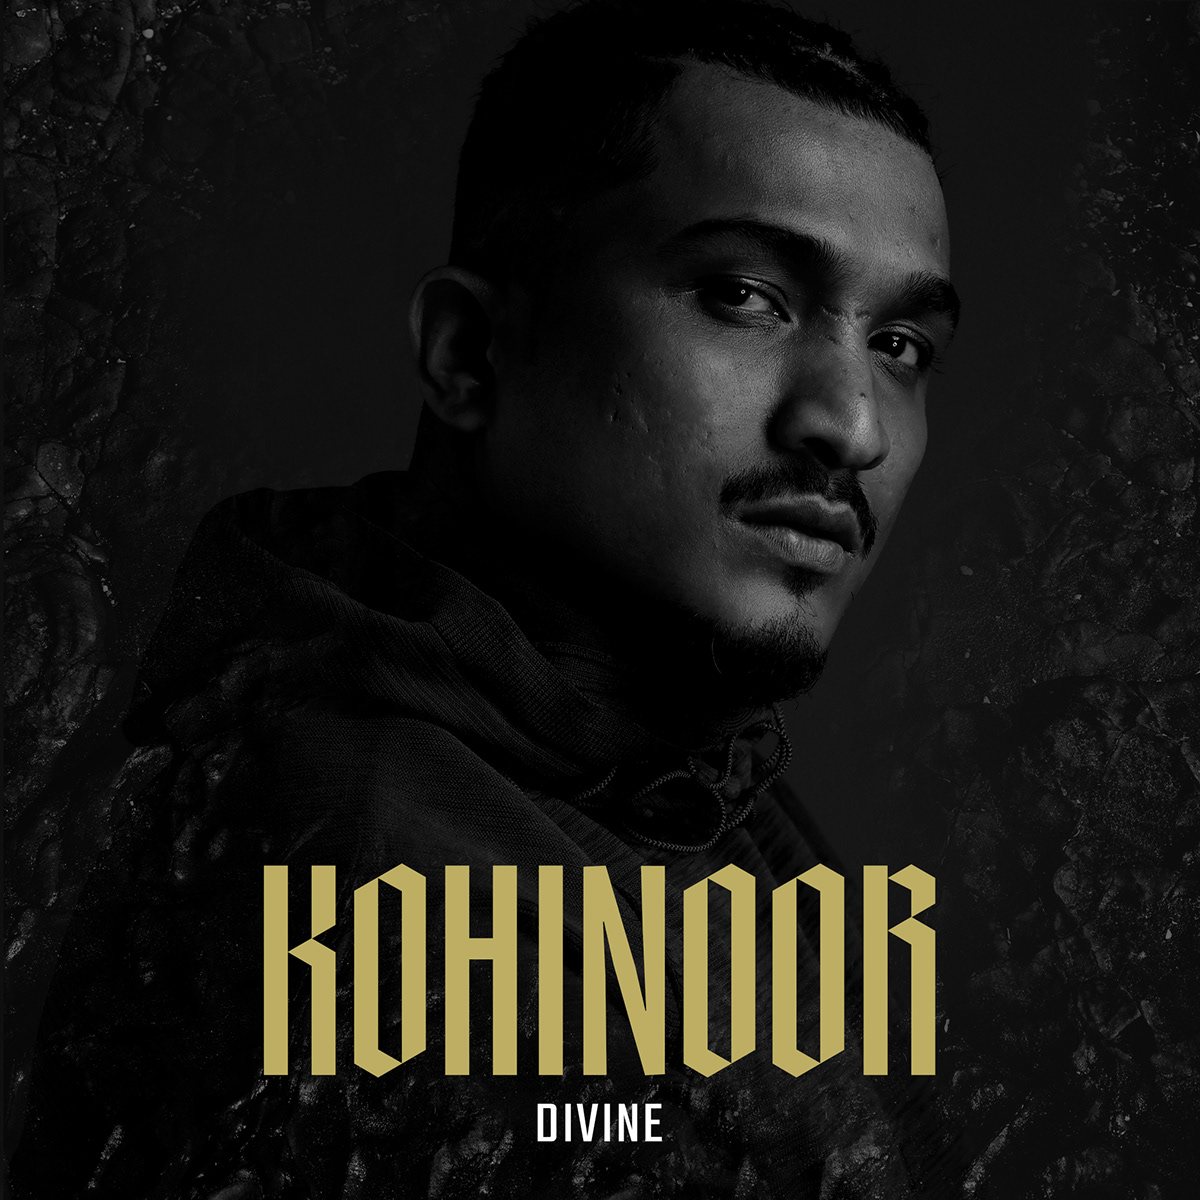 album cover black and white divine hip hop kohinoor  MUMBAI photoshoot portrait rap rapper